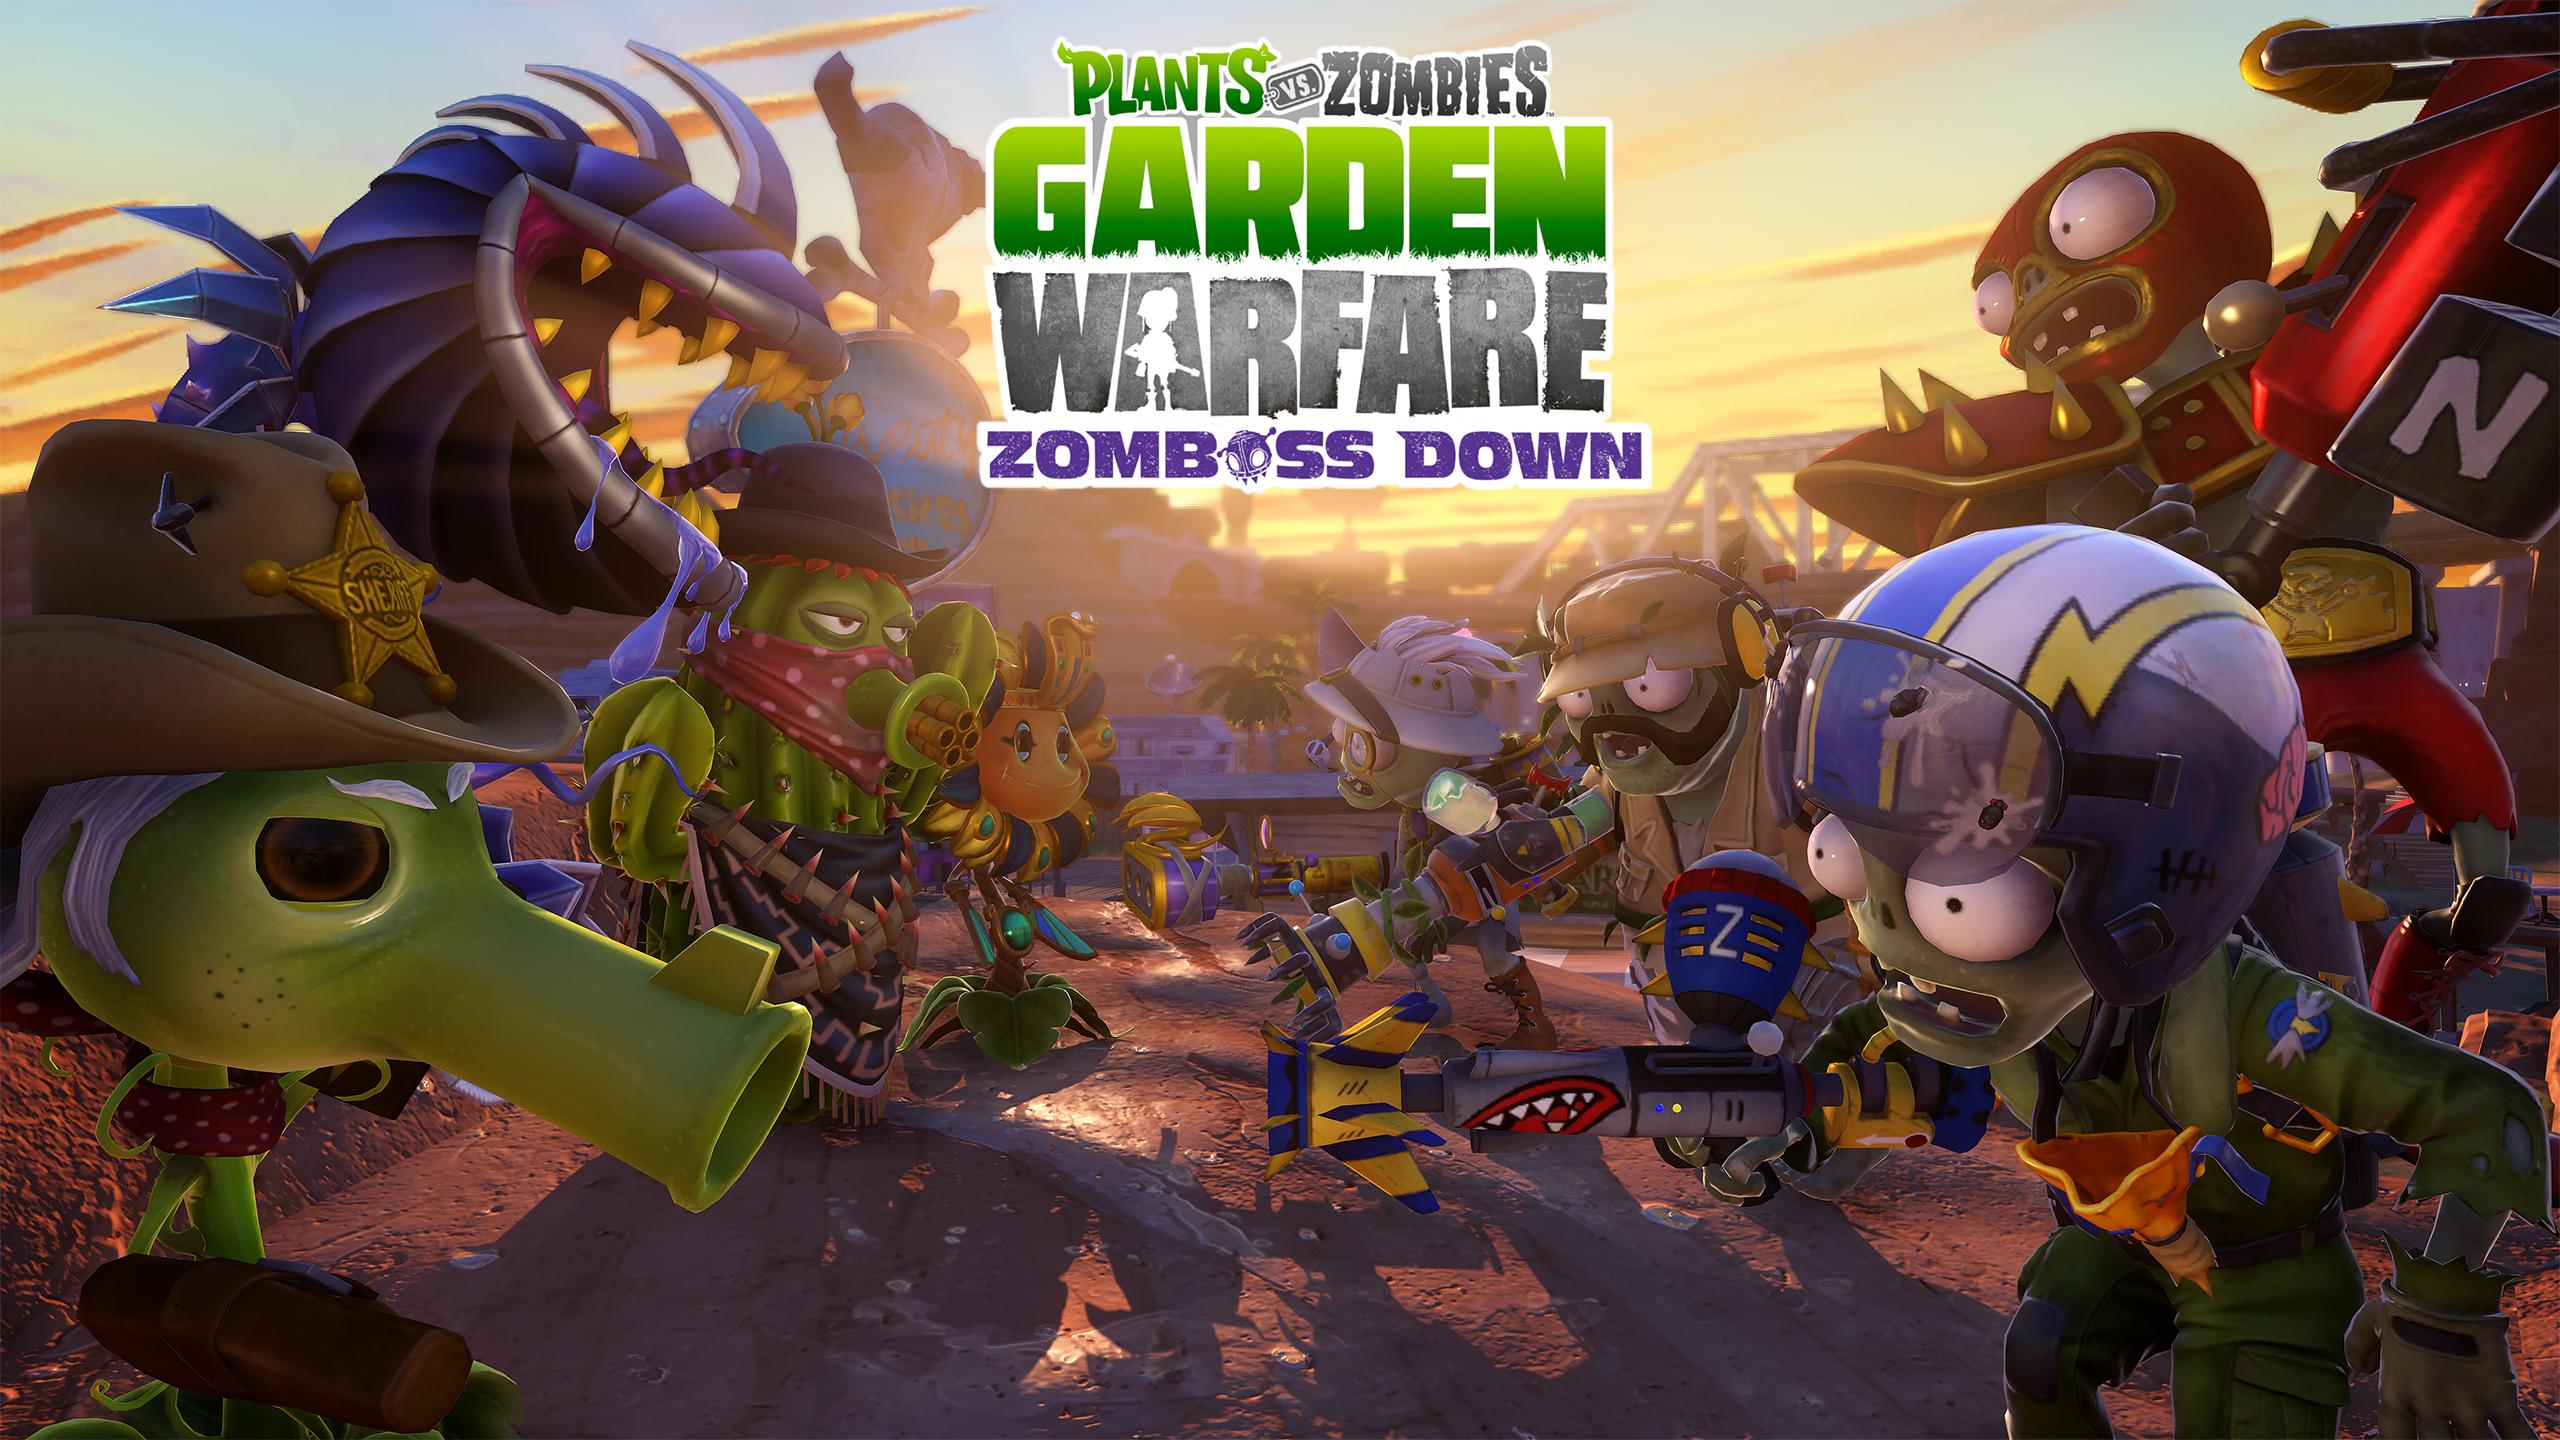 Plants Vs Zombies Garden Warfare Goes West Free Zomboss Down Dlc Available Now Neoseeker